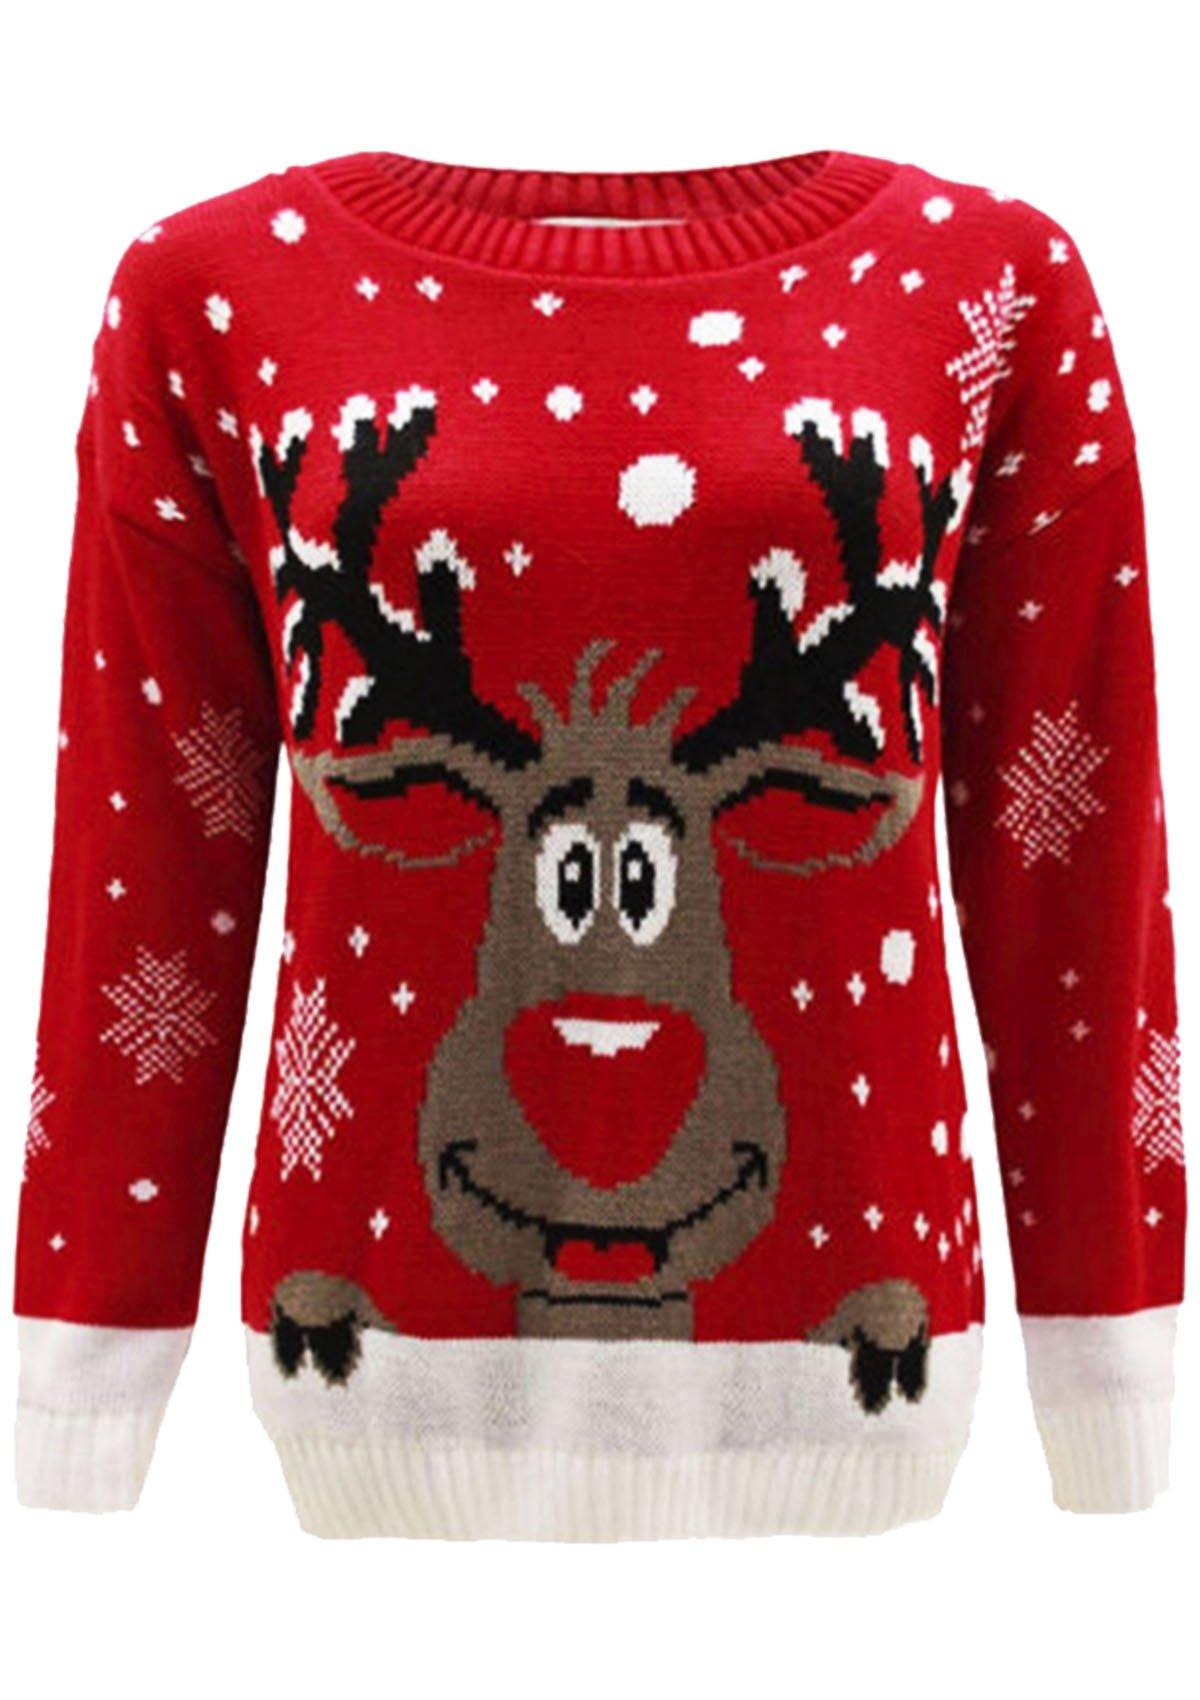 New Children Kids Boys Girls Knitted Retro Novelty Christmas Xmas Jumper Age 3-12 Years